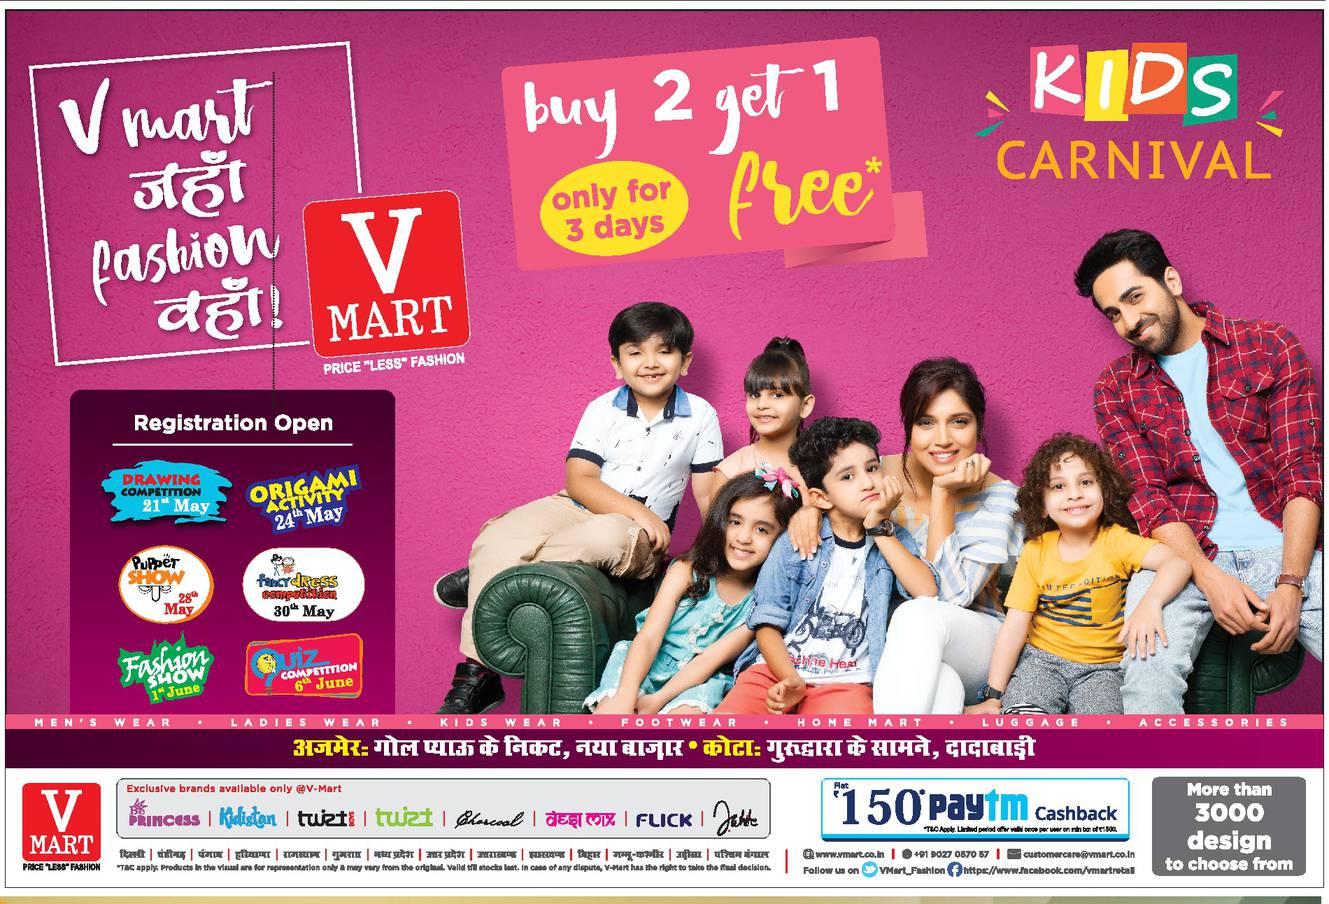 V Mart Kids Carnival Buy 2 Get 1 Free Ad - Advert Gallery 69162c45f7d